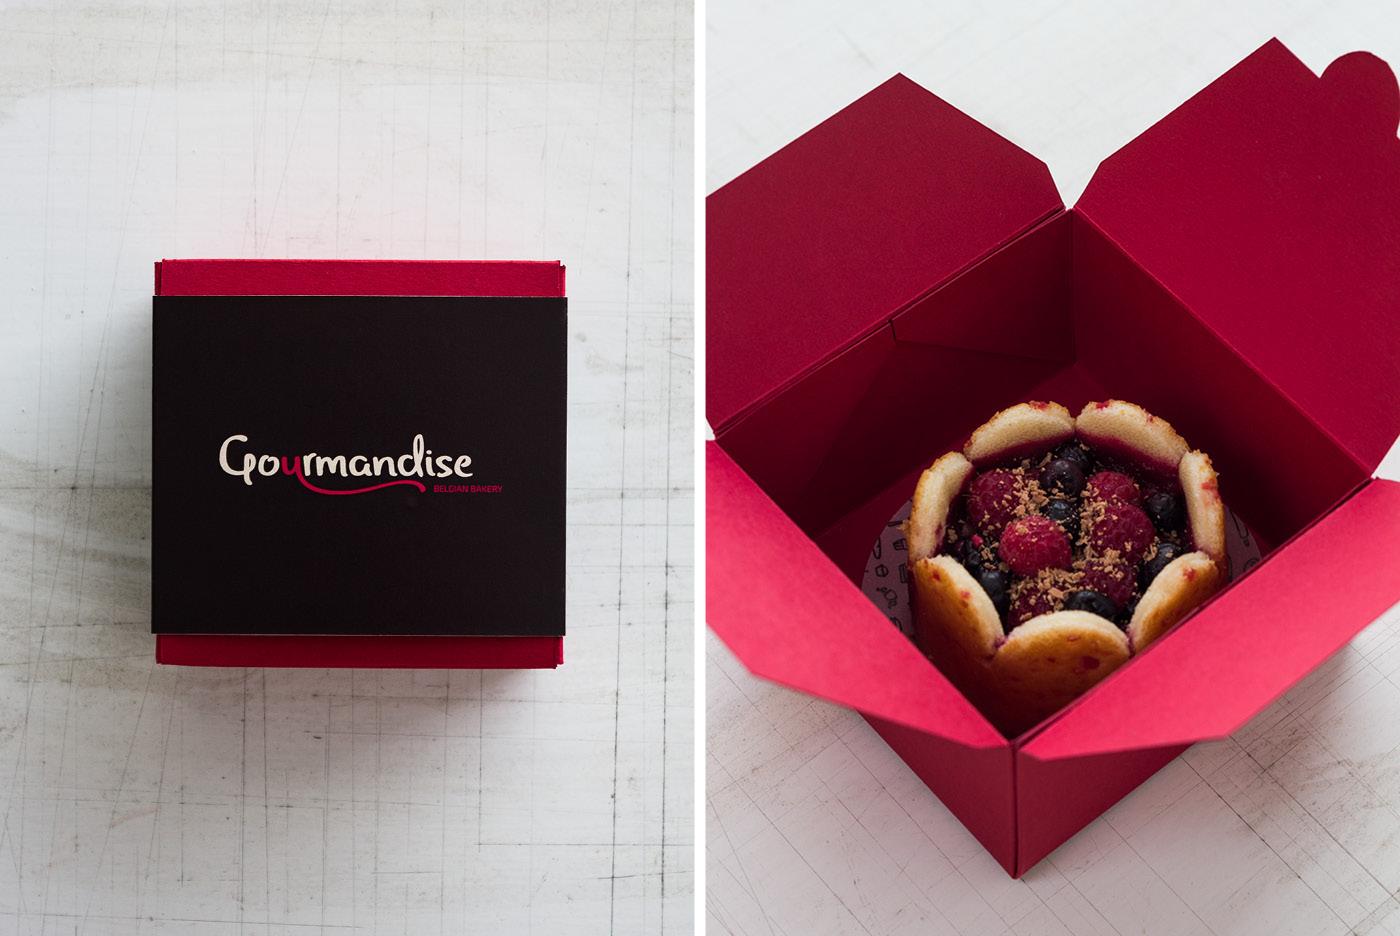 Adobe Portfolio bakery belgium French Coffee cake macaron Typeface font free download baguette croissant appetising takeaway box